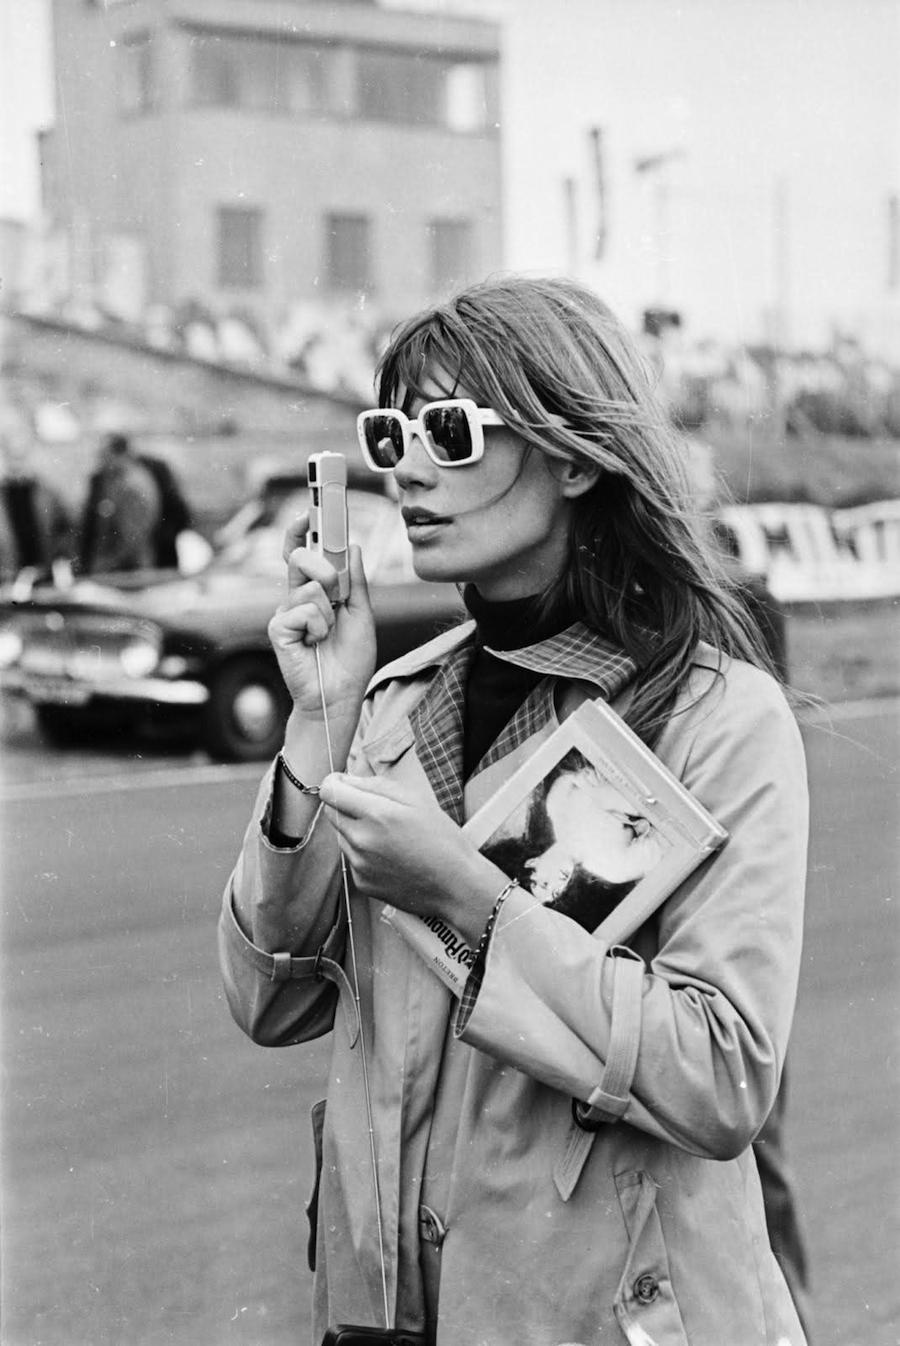 francoise-hardy-sunglasses-camera.jpg?w=